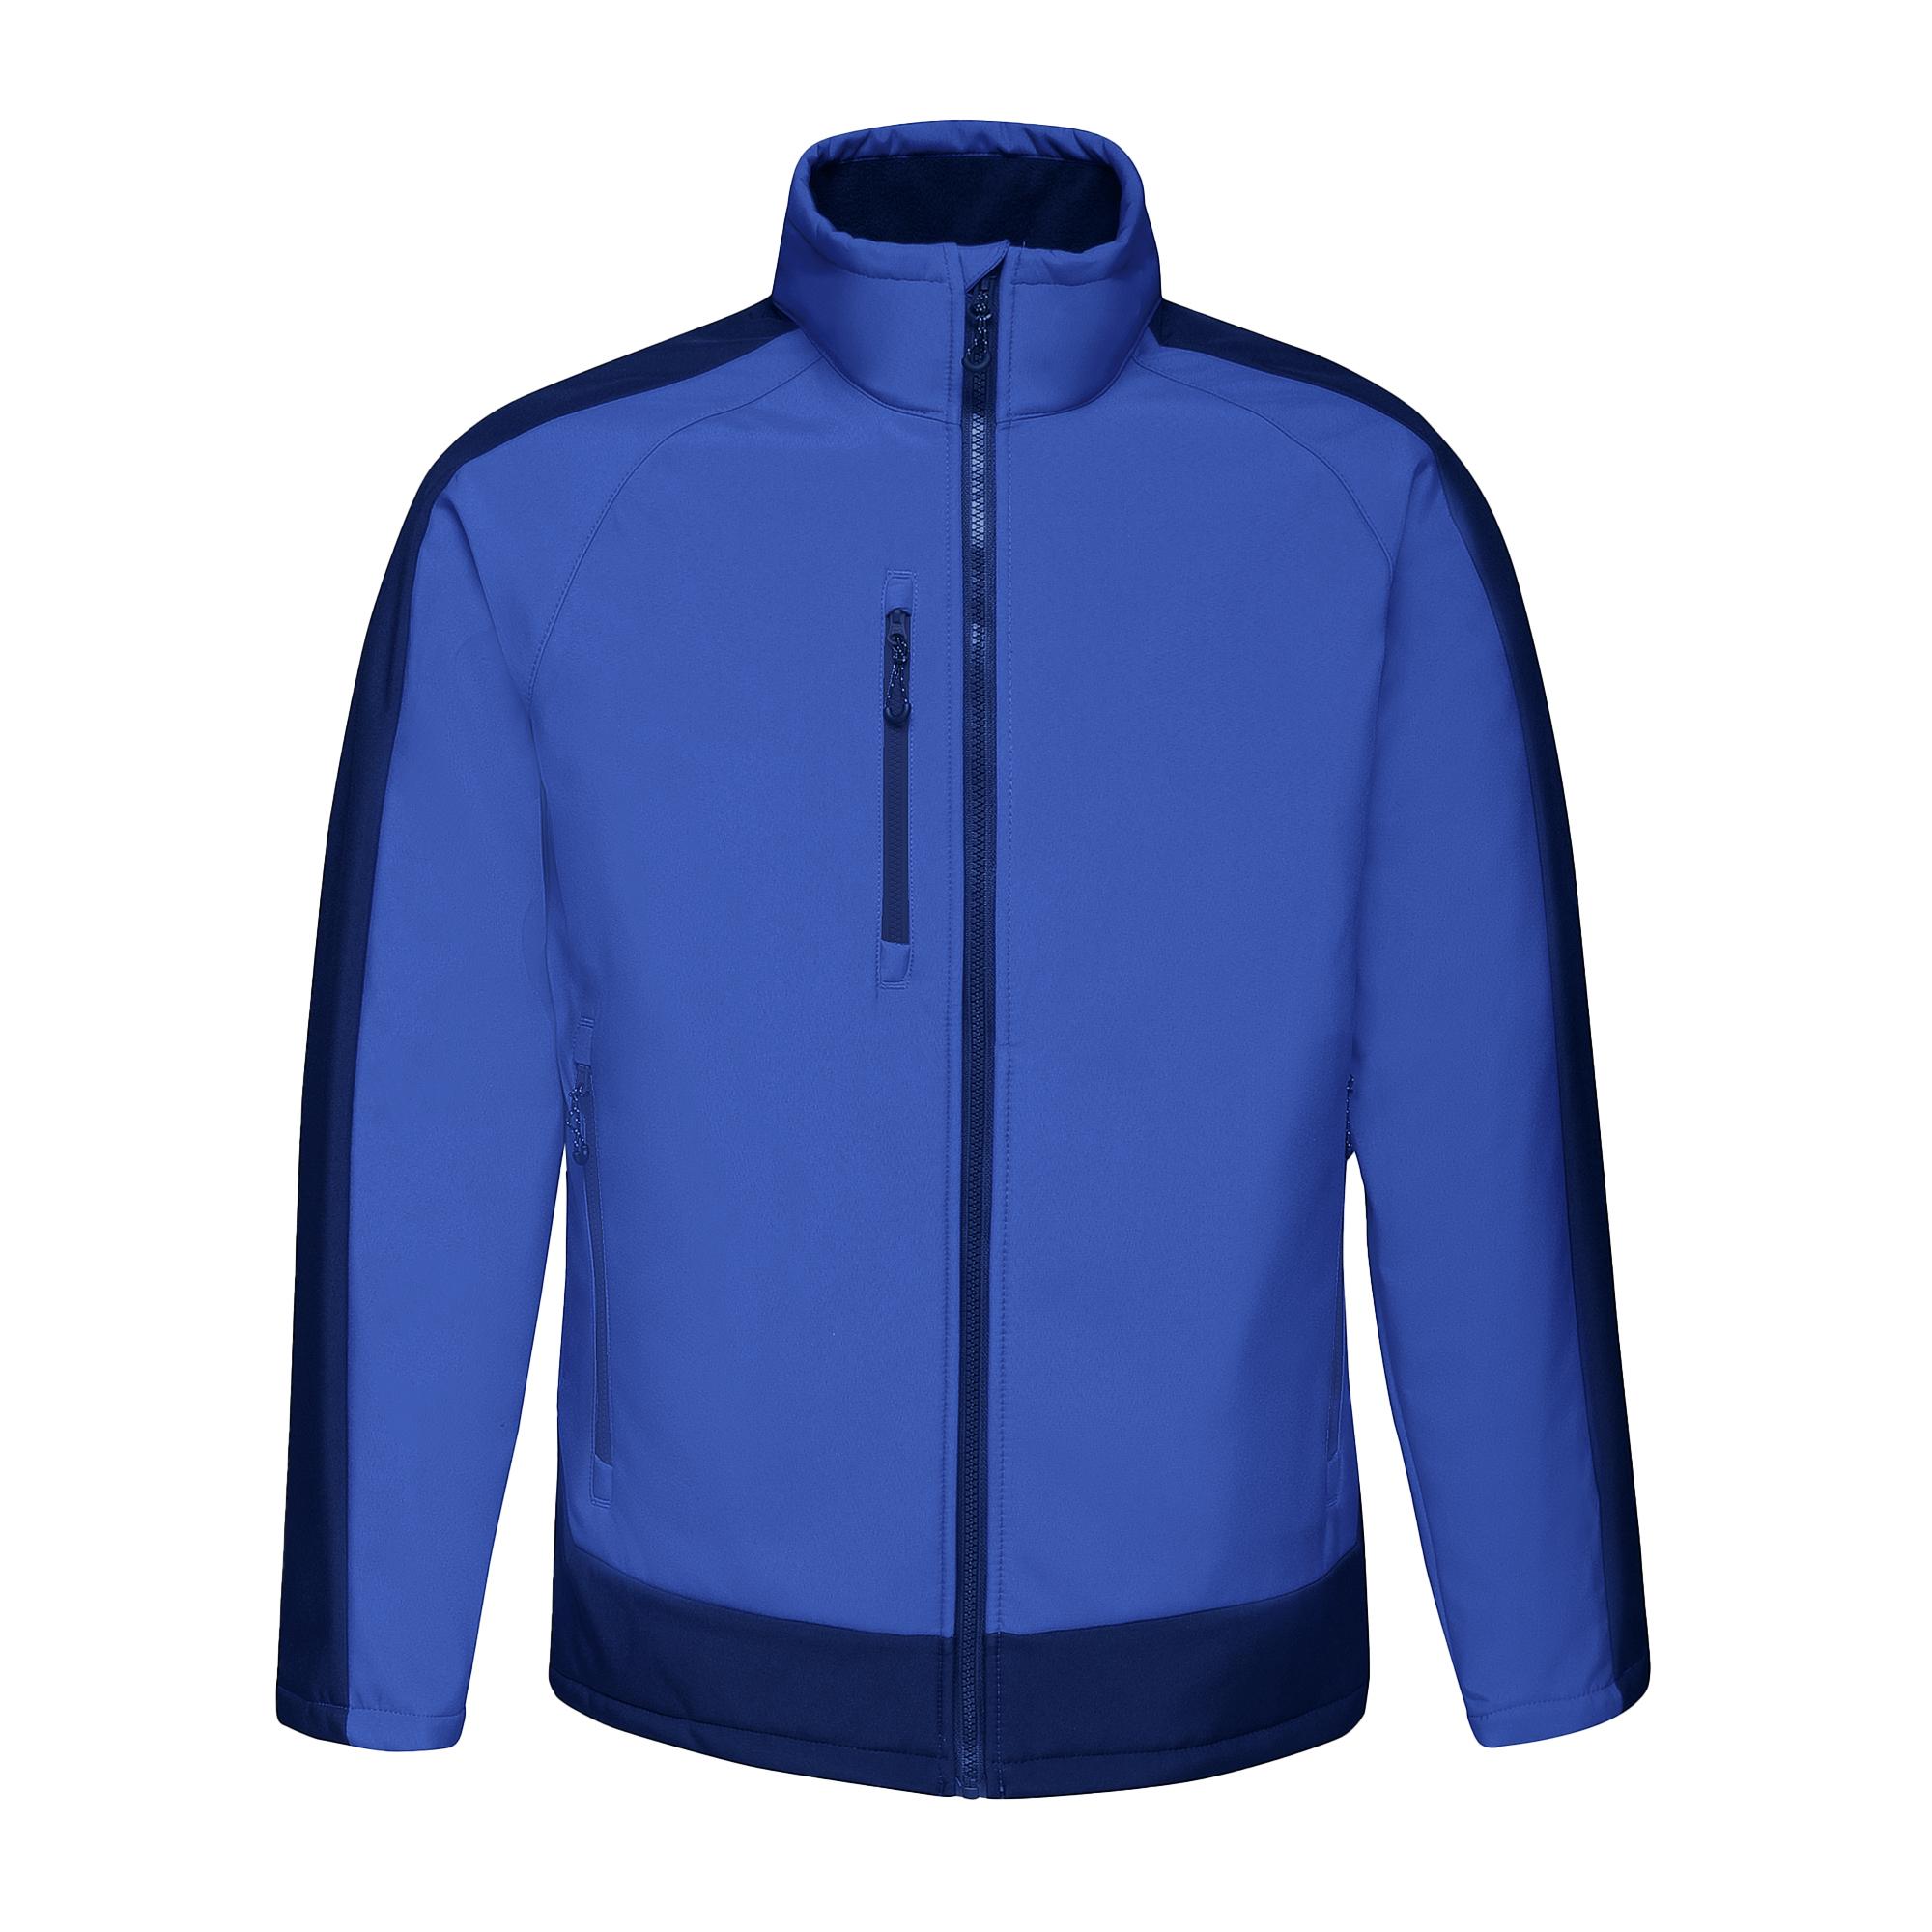 Regatta Contrast Mens 3-Layer Printable Softshell Jacket (4XL) (Seal/Black)